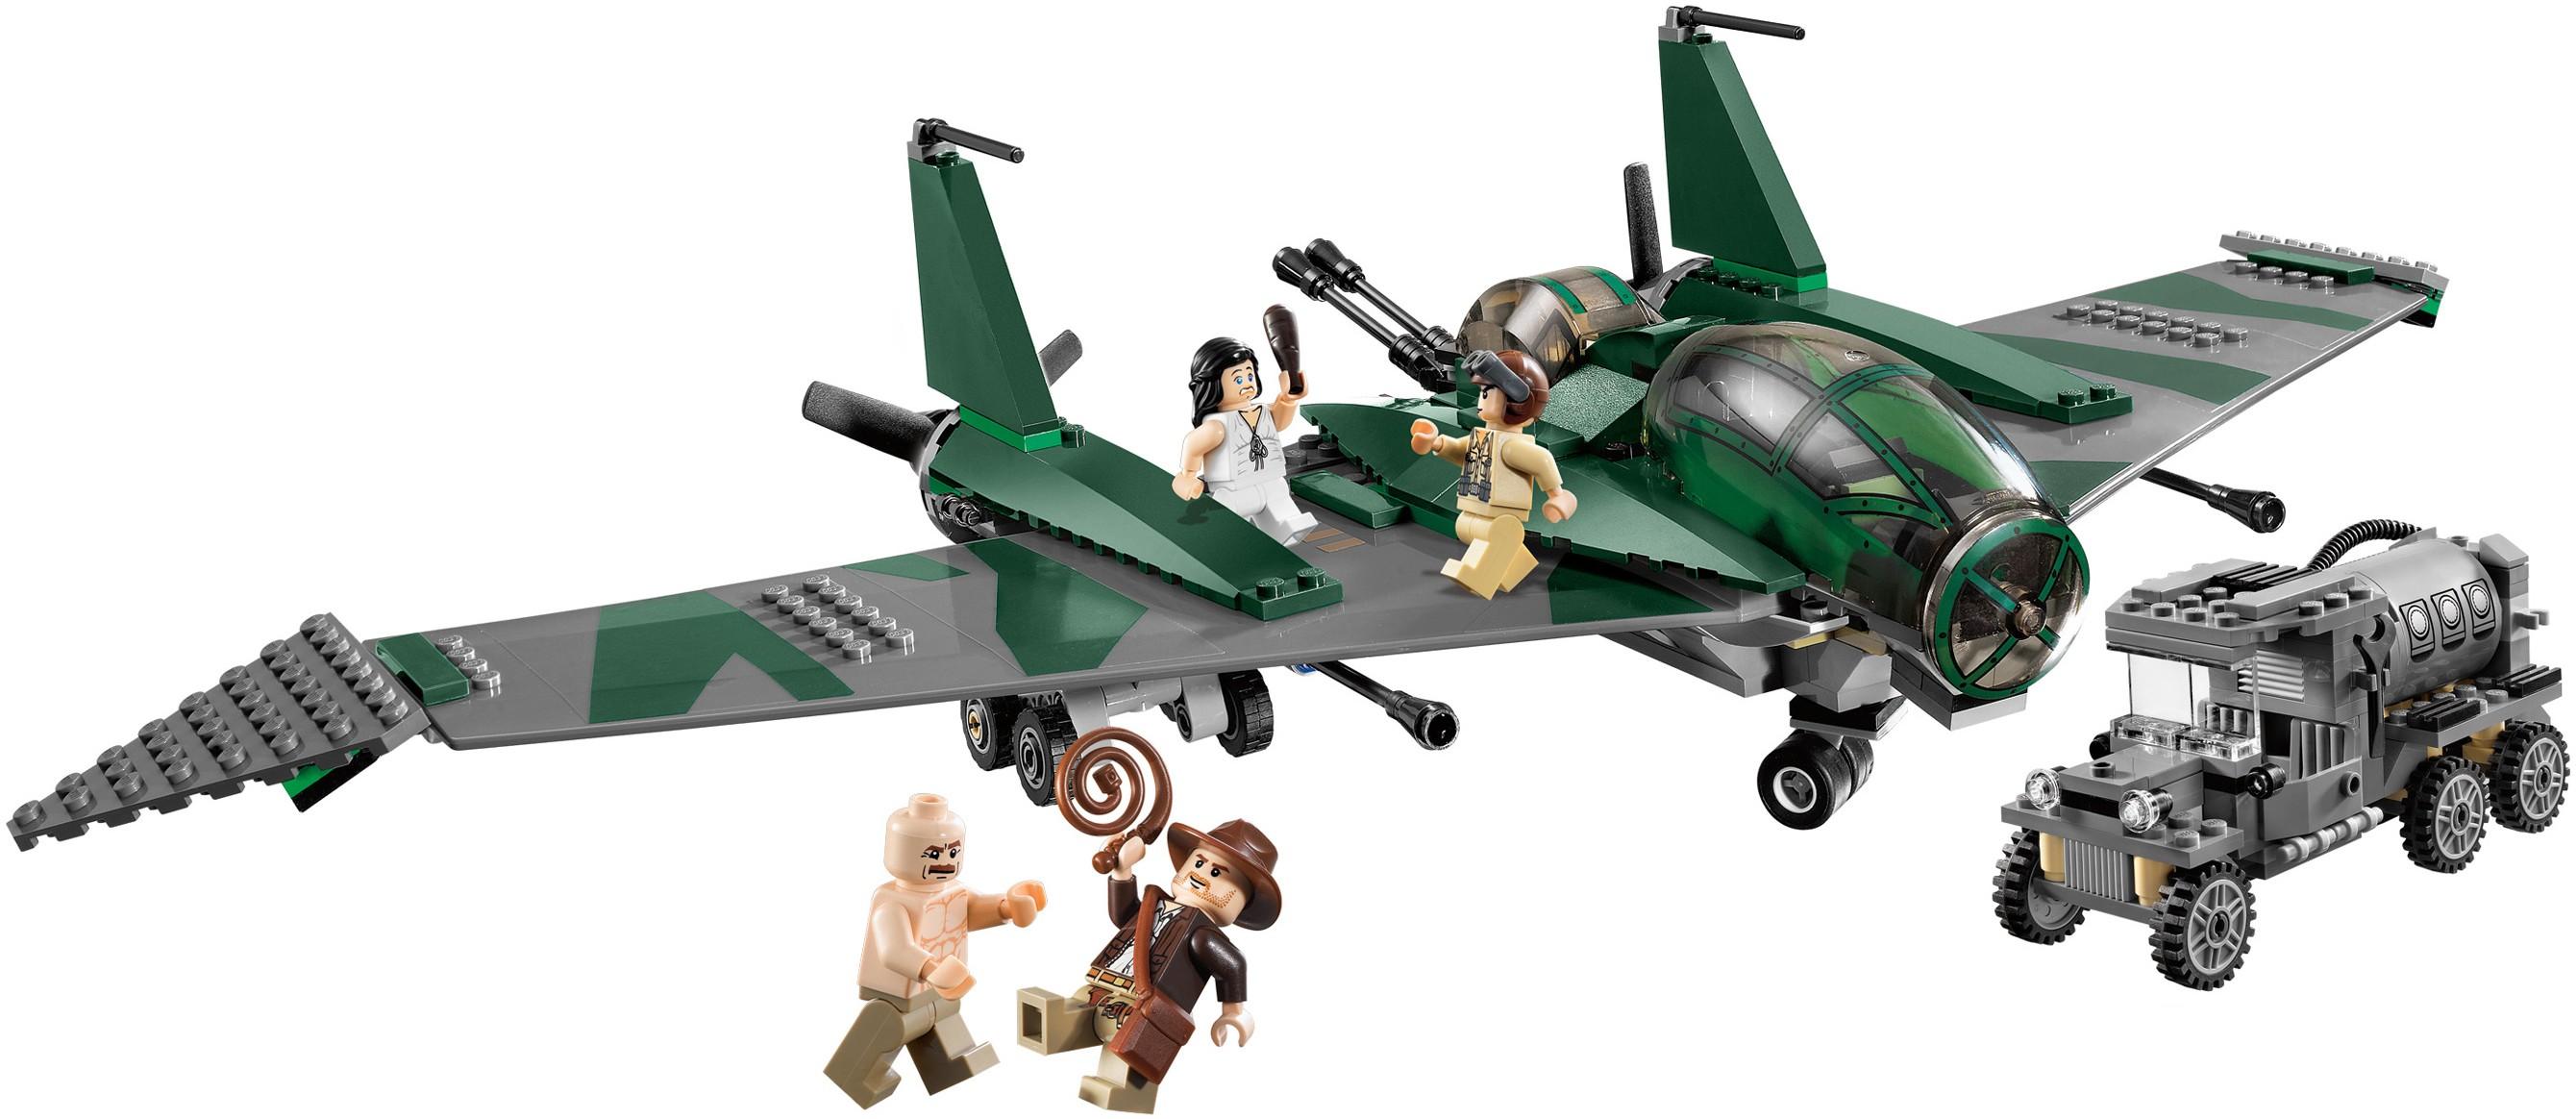 Indiana Jones Raiders Of The Lost Ark Brickset Lego Set Guide